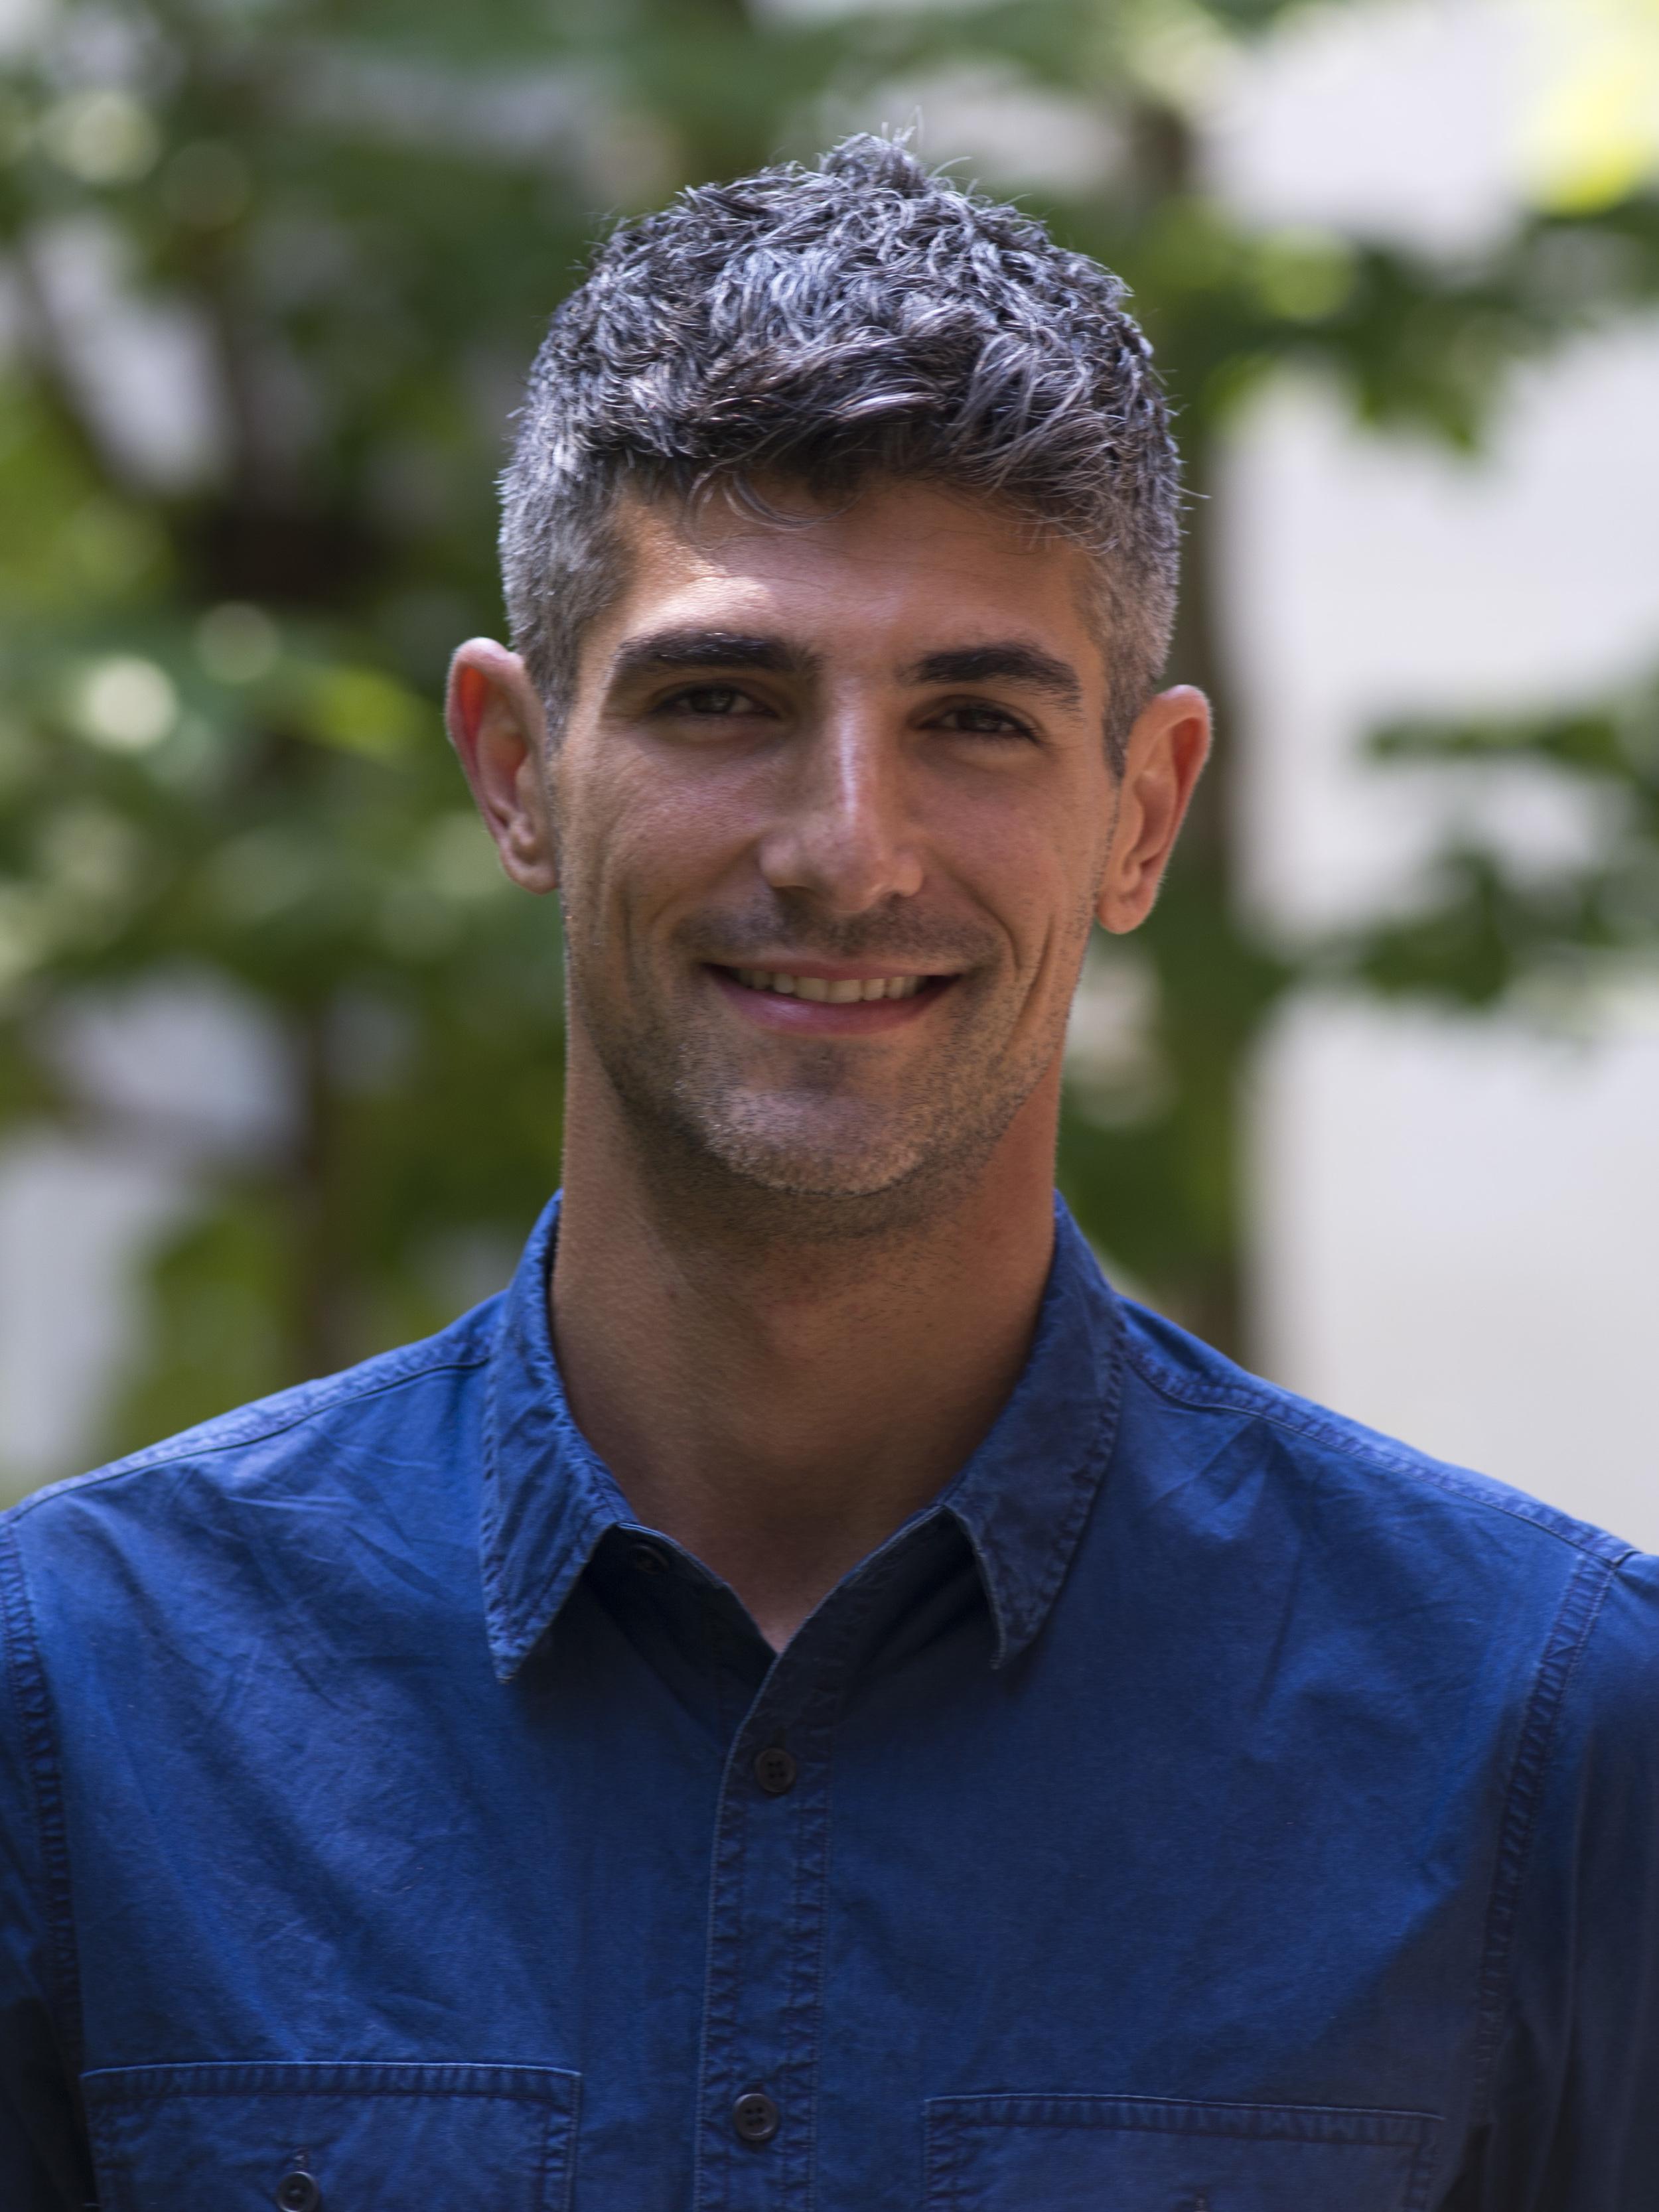 Bryan Rosenberg